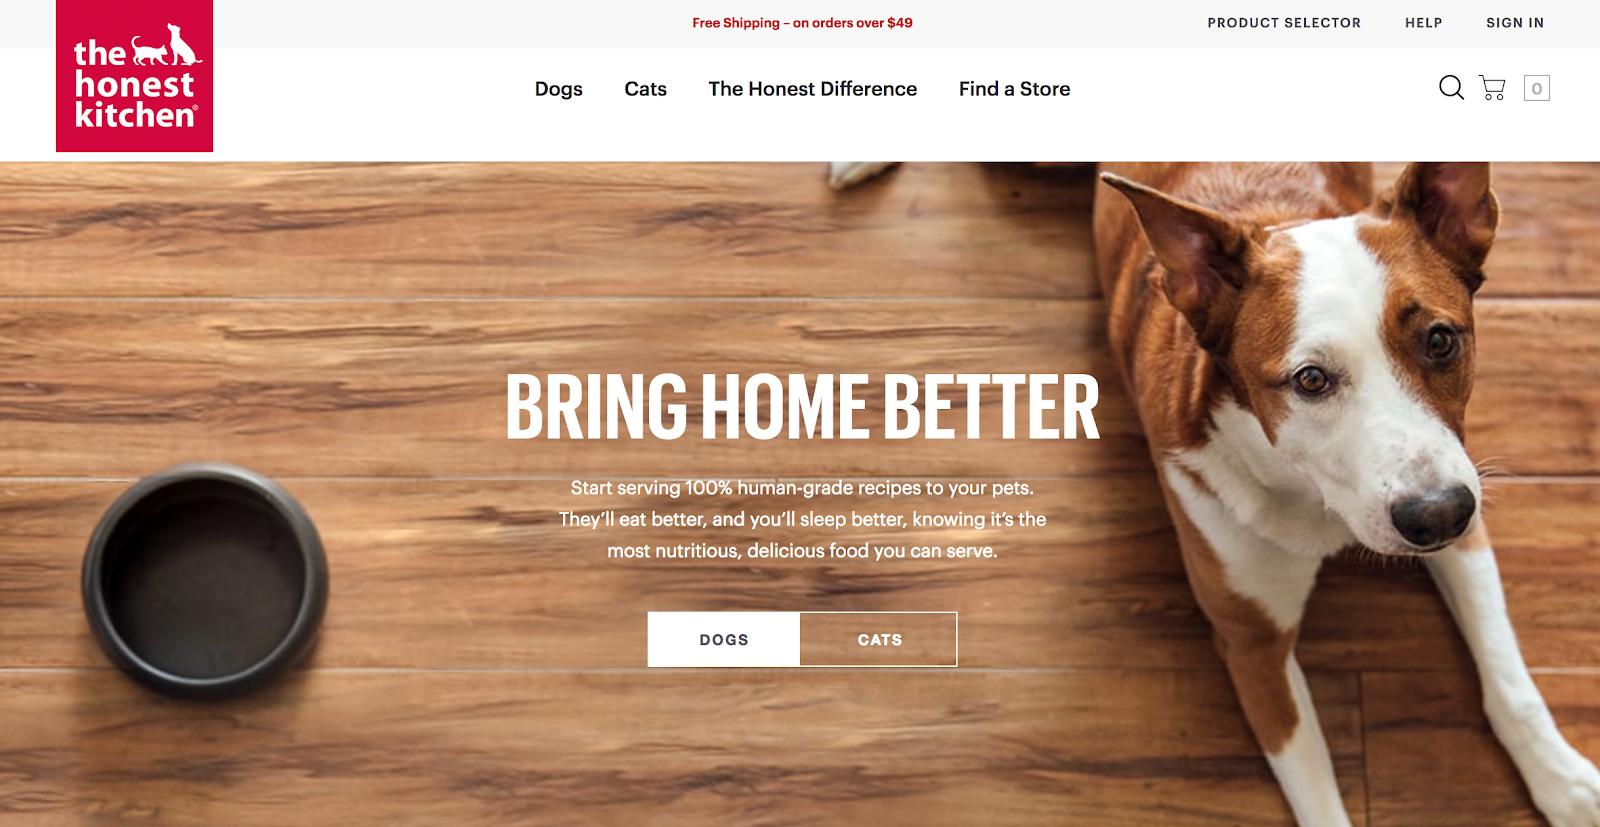 Pet Brands - the Honest Kitchen